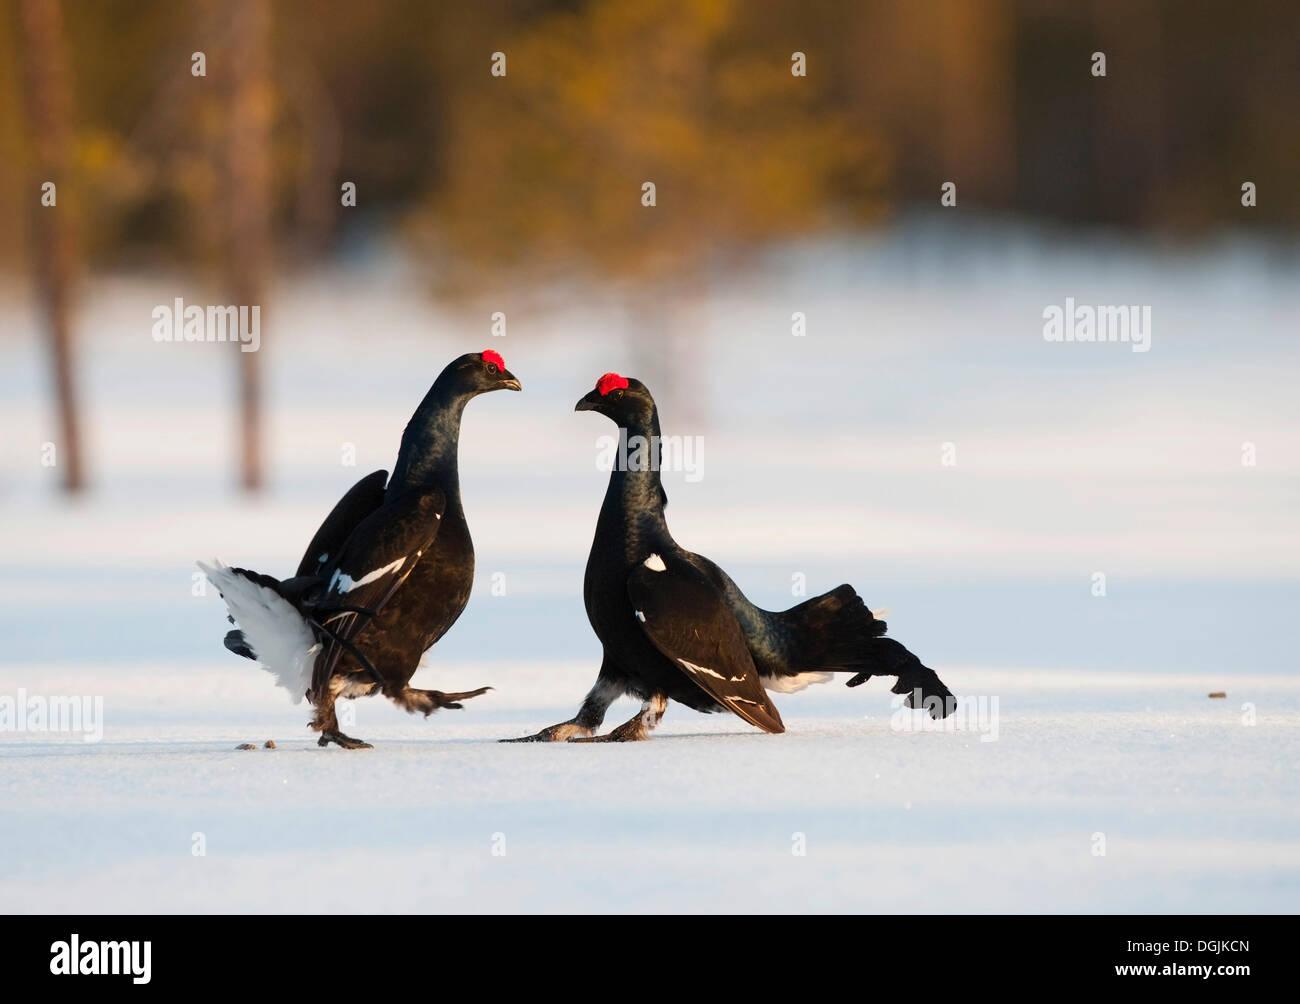 Black grouse, blackgame (Lyrurus tetrix, Tetrao tetrix), males performing the courtship display - Stock Image